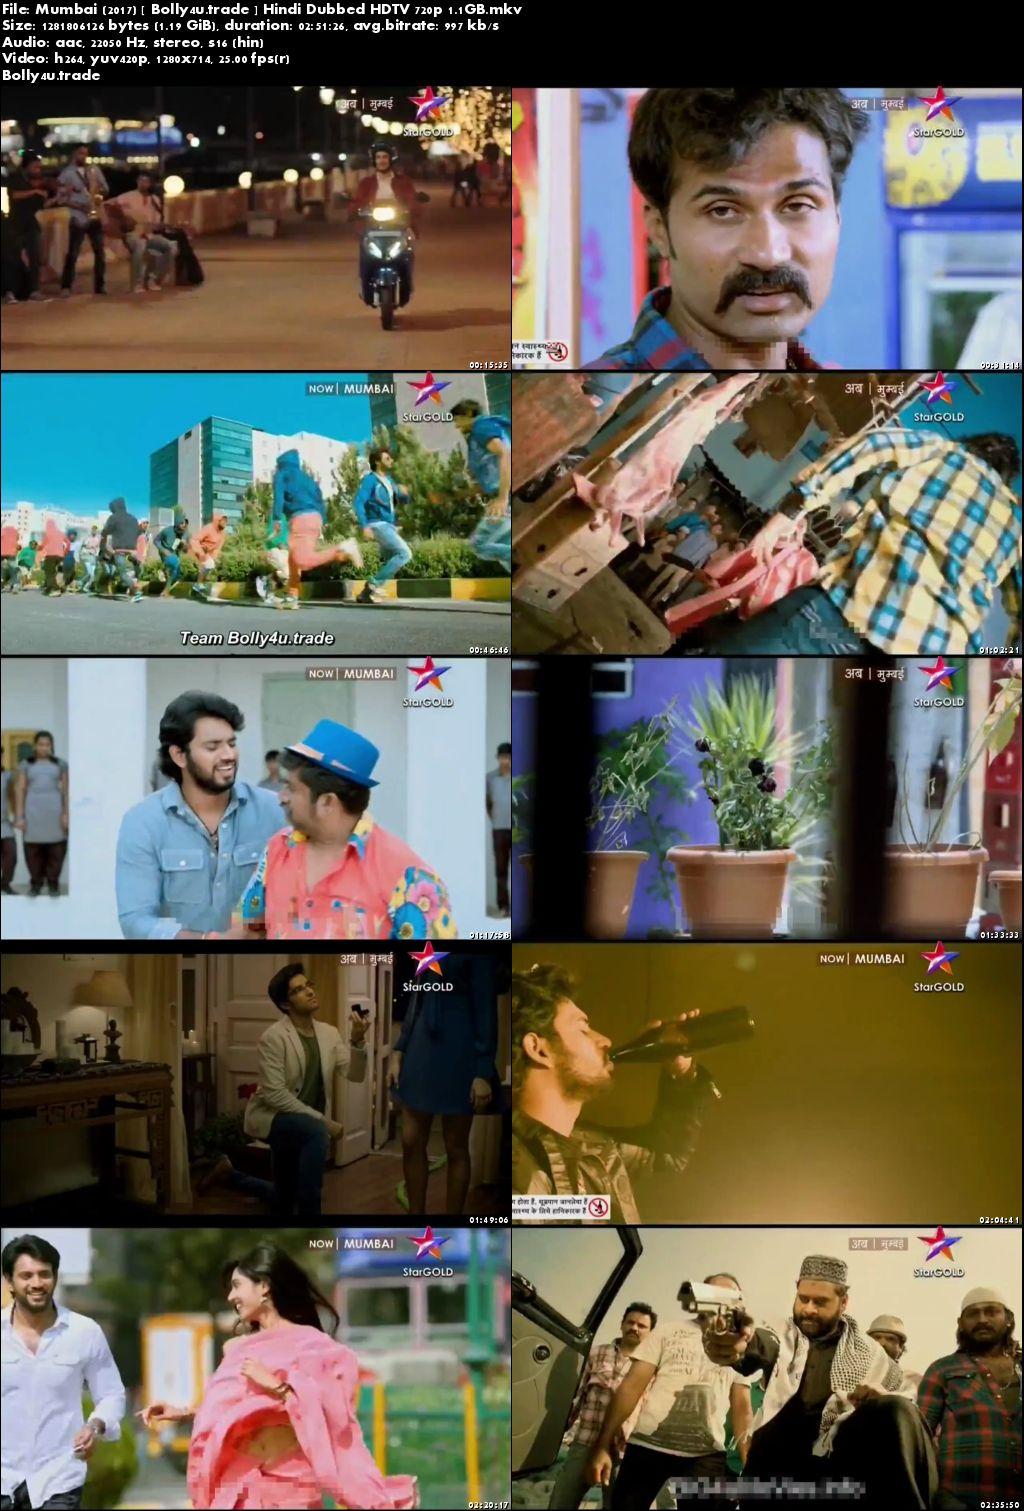 Mumbai 2017 hdtv 500mb full hindi dubbed movie download 480p mumbai 2017 hdtv 500mb full hindi dubbed movie download 480p ccuart Gallery